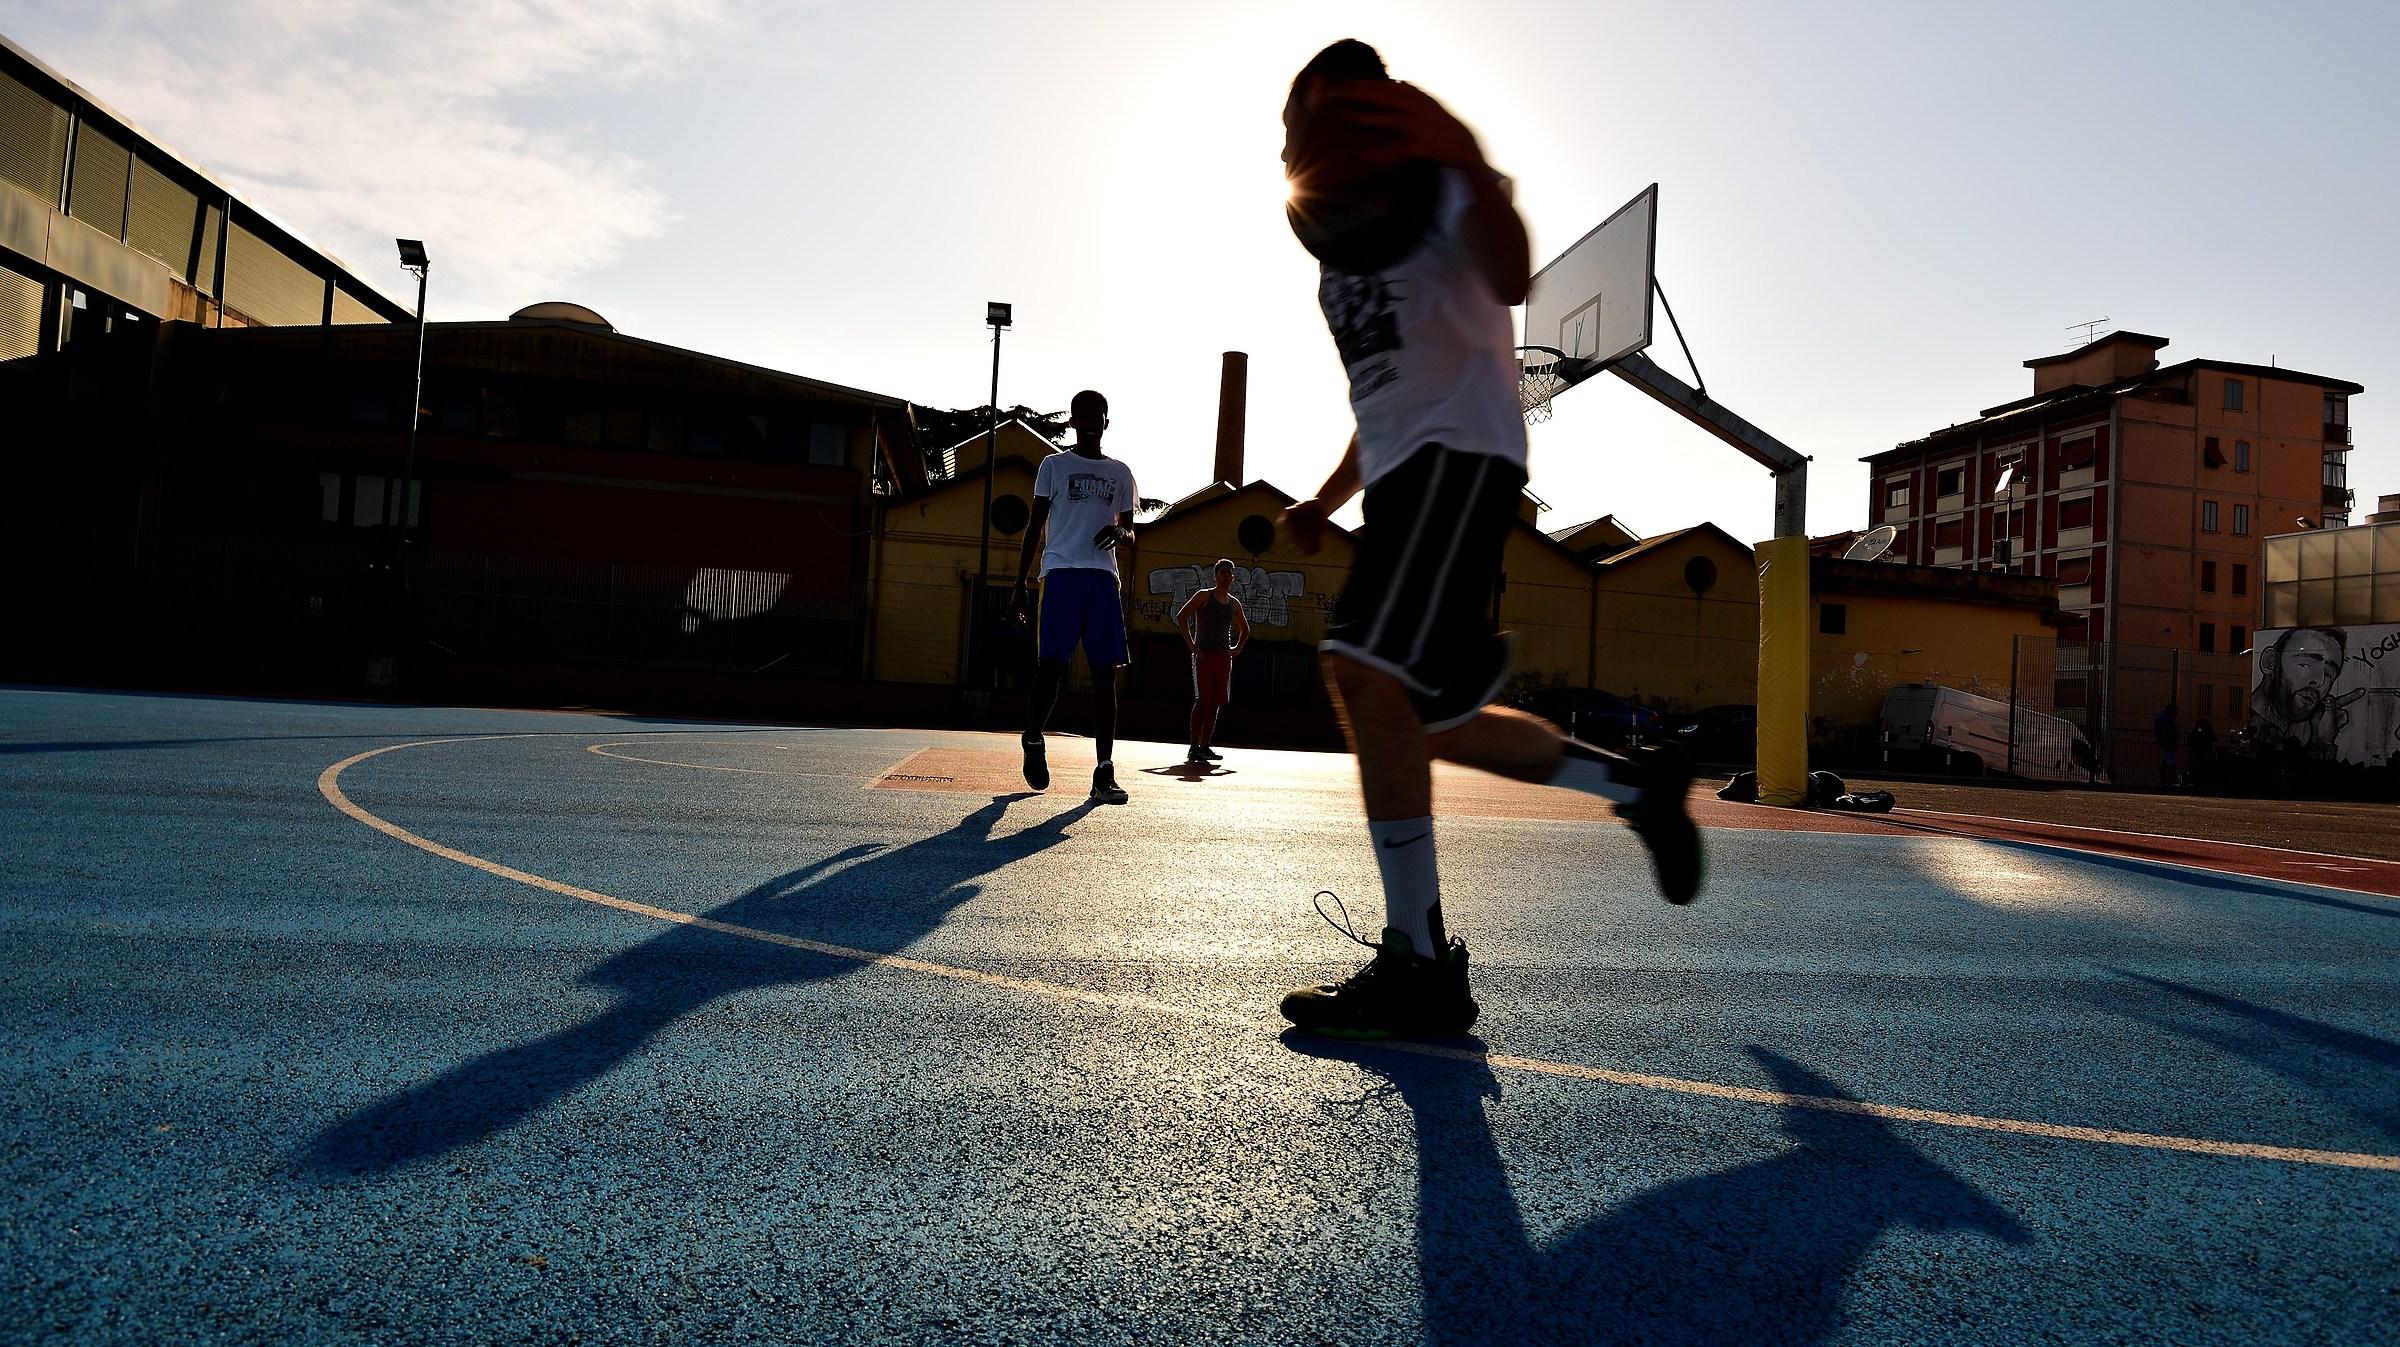 Street Basketball...